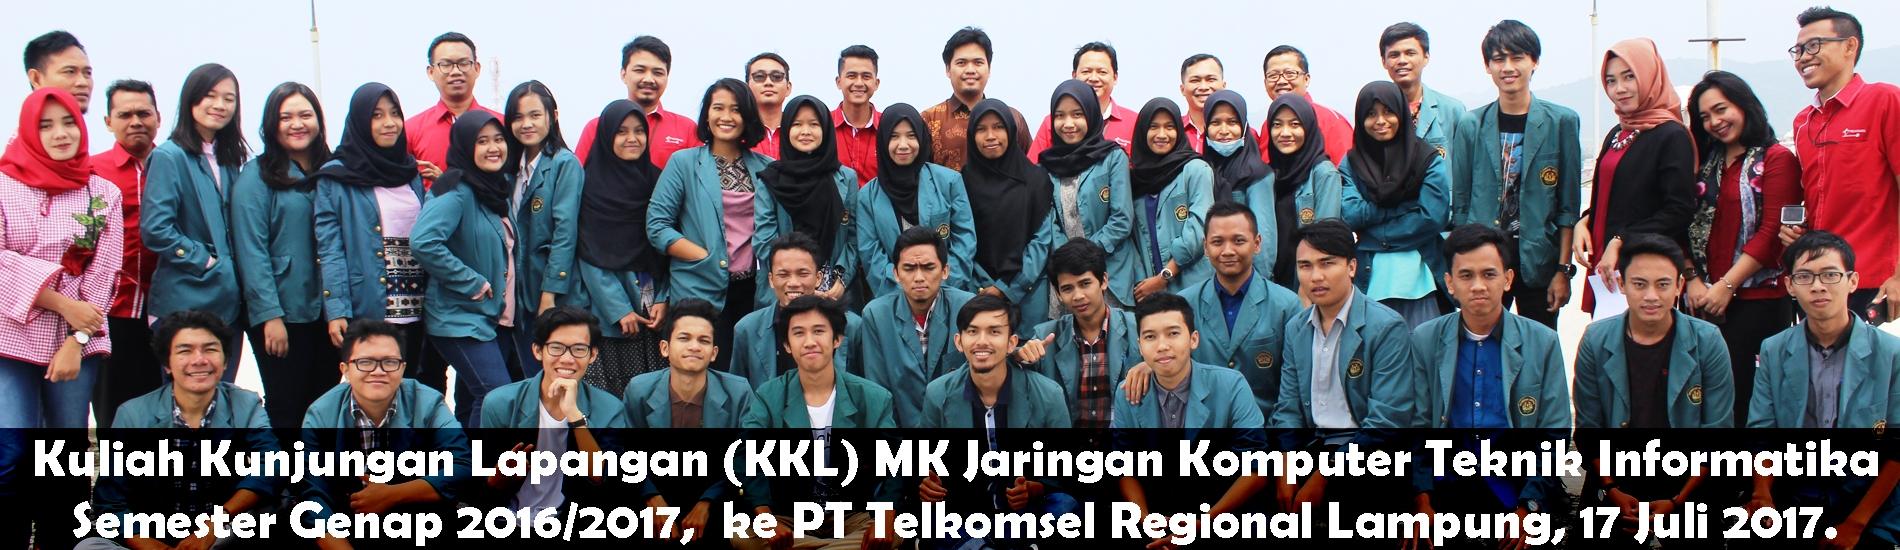 KKL 2017